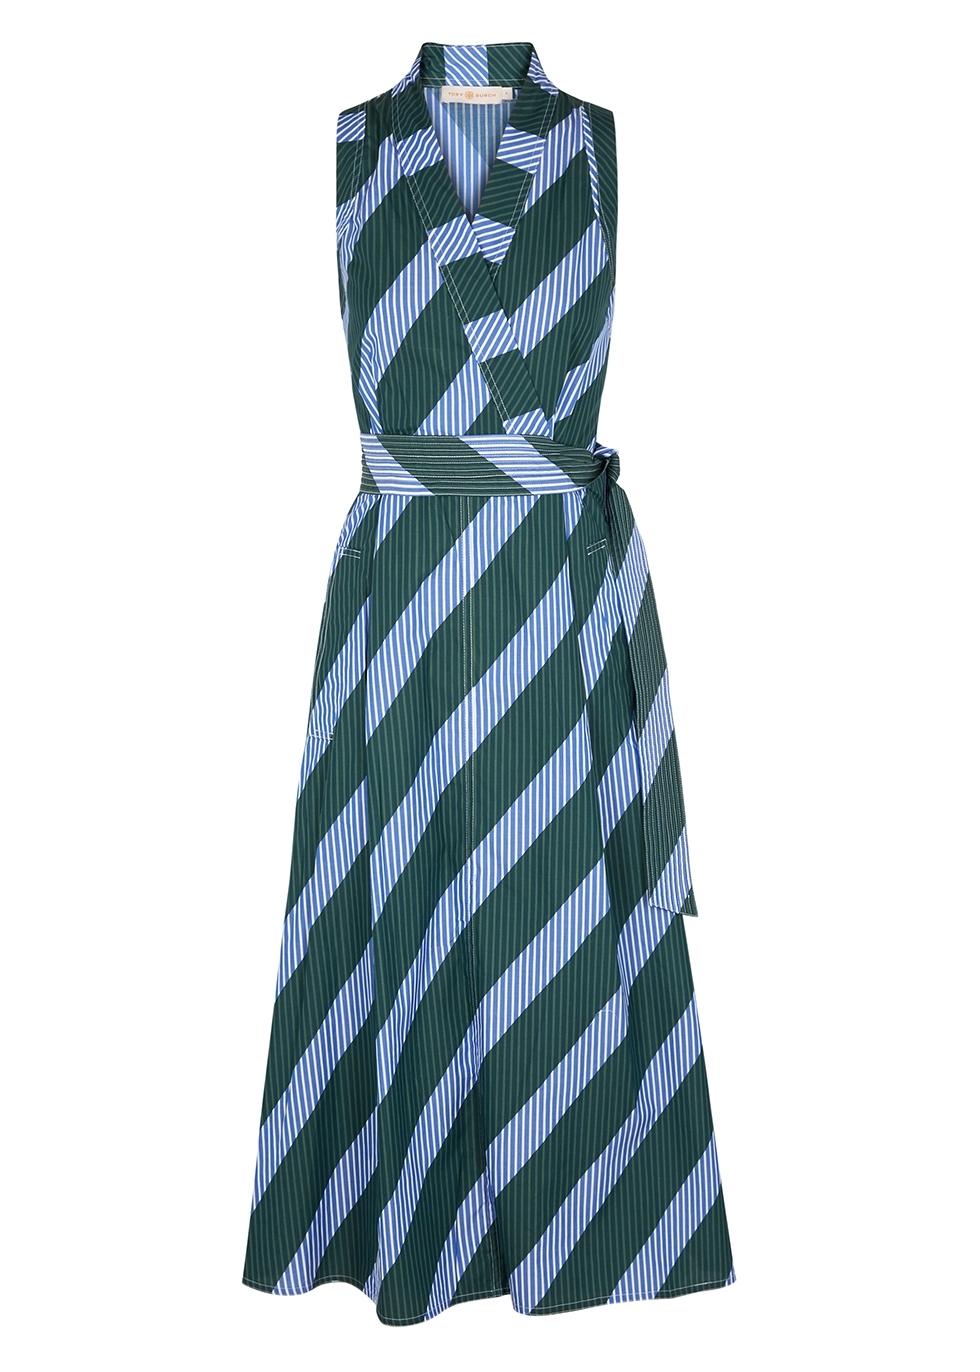 63d3b68e626 Designer Dresses & Designer Gowns - Harvey Nichols